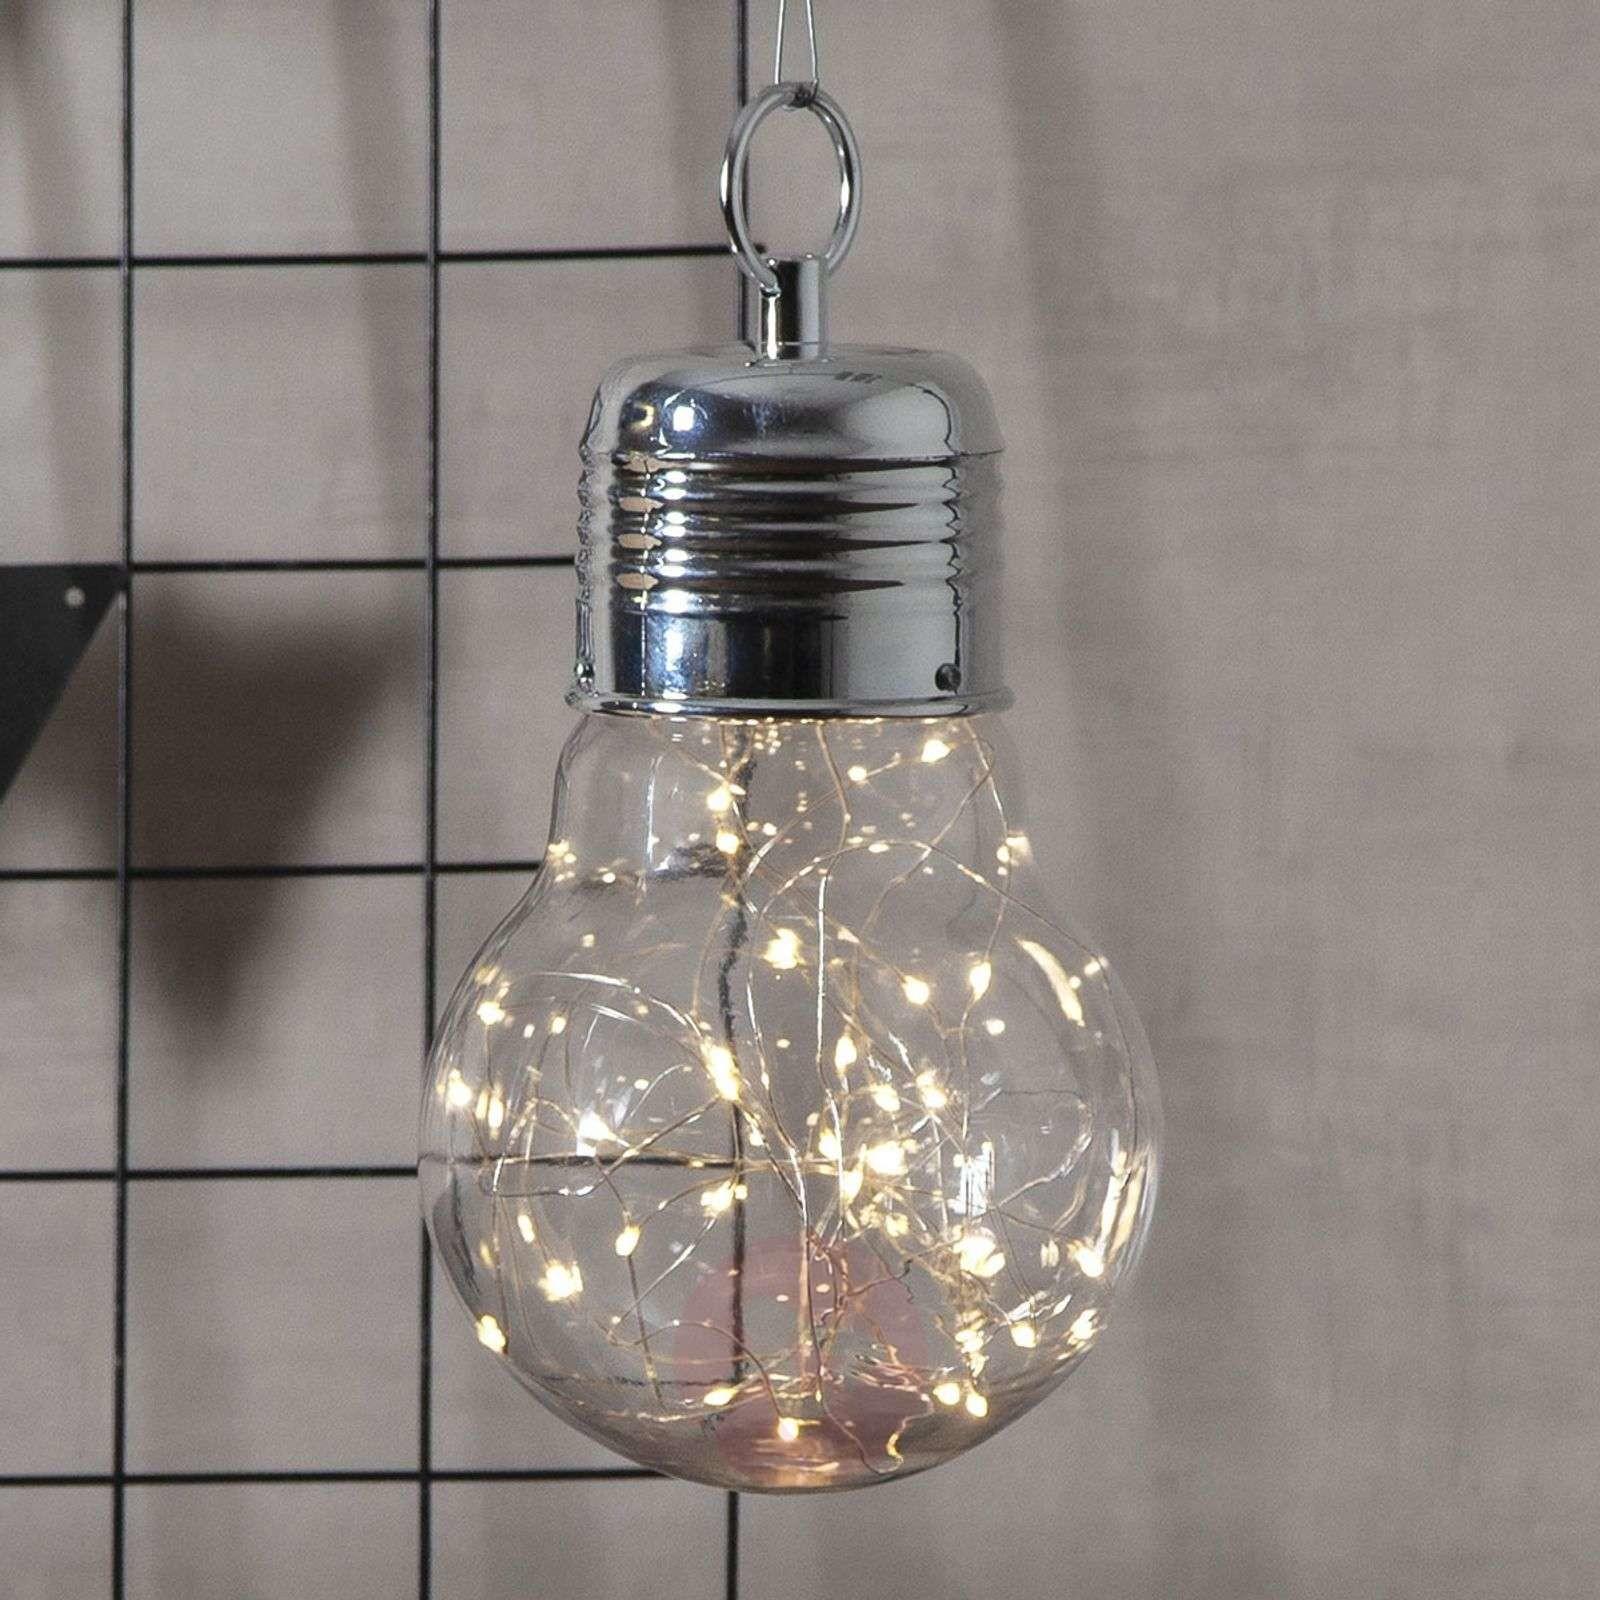 Best Season LED-Dekoleuchte Bulby, weiß